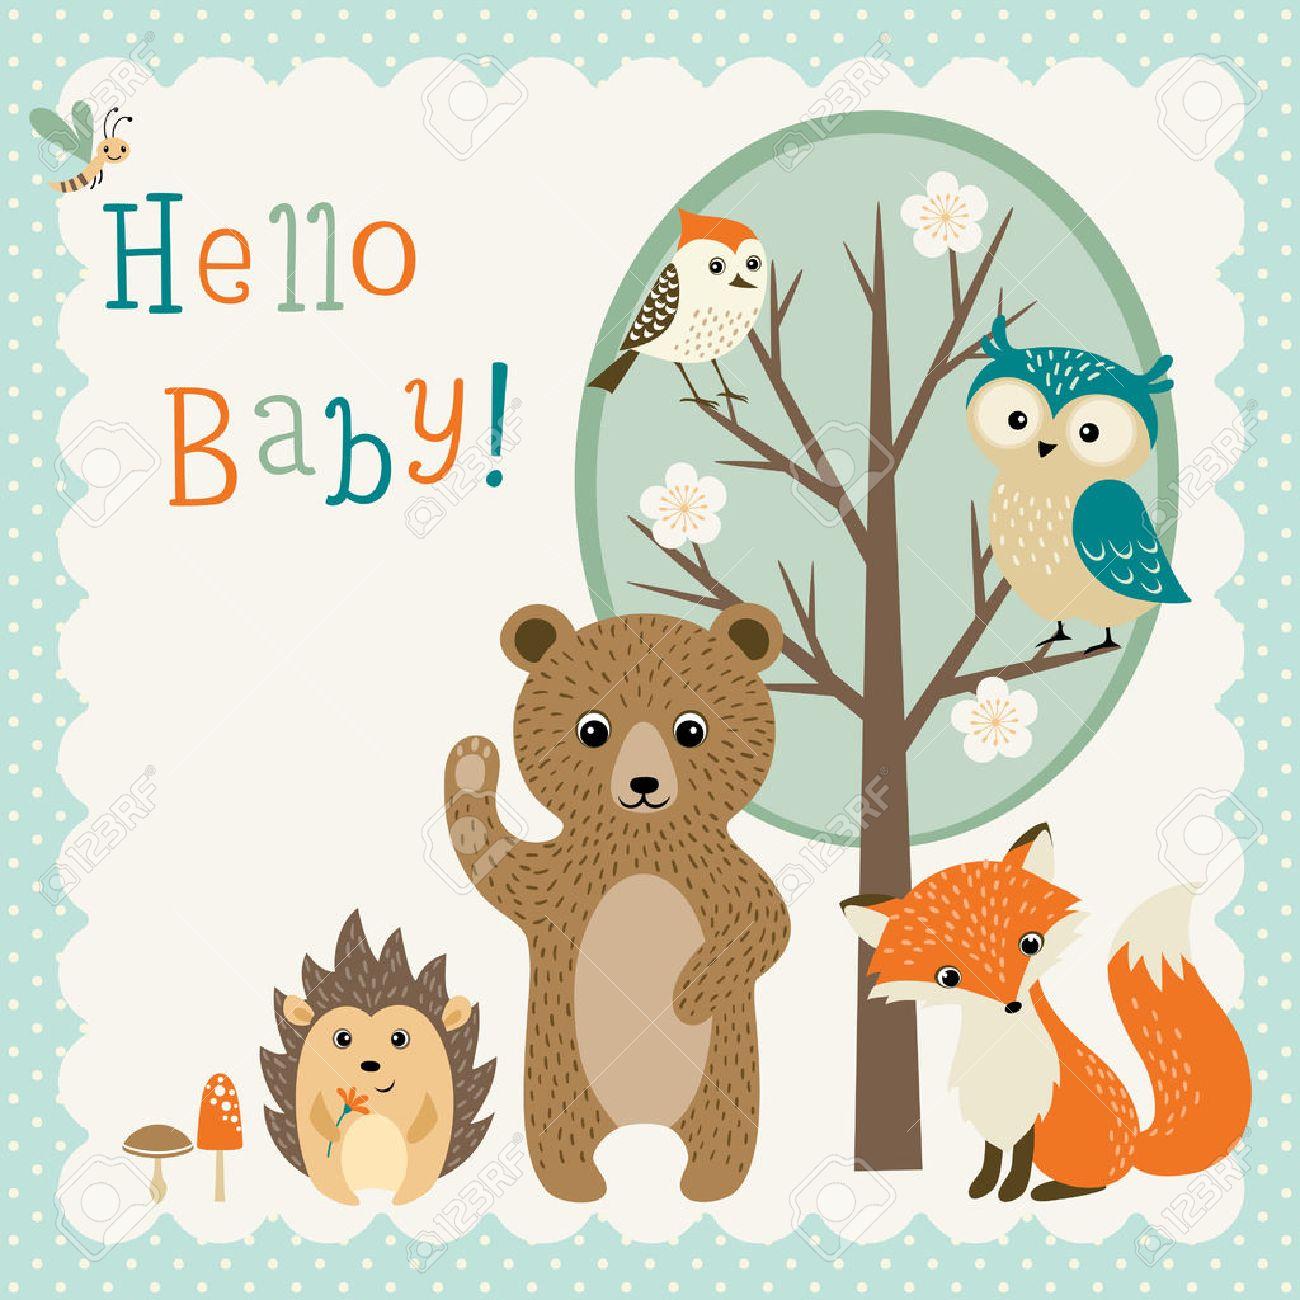 Baby shower design with cute woodland animals. - 41214419